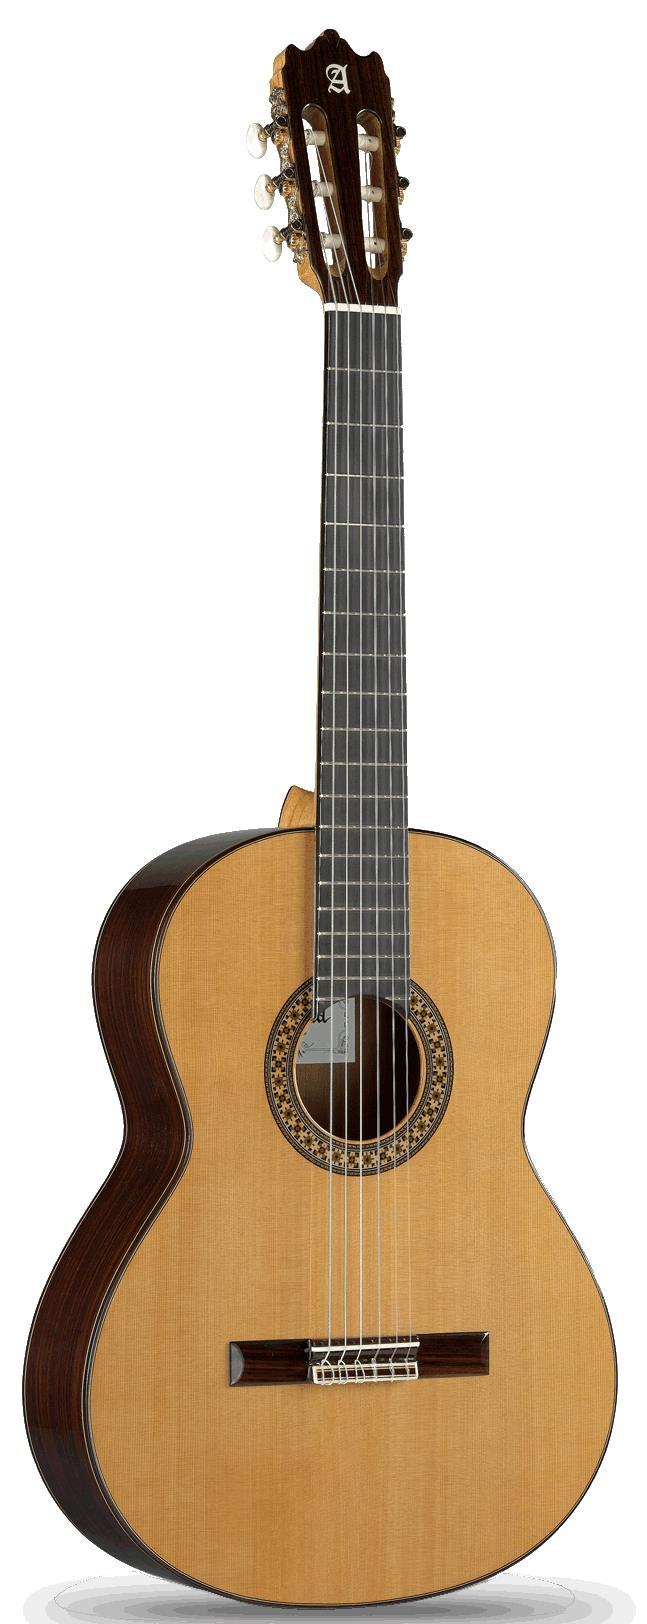 Гитара Alhambra 807-4P Classical Conservatory 4P